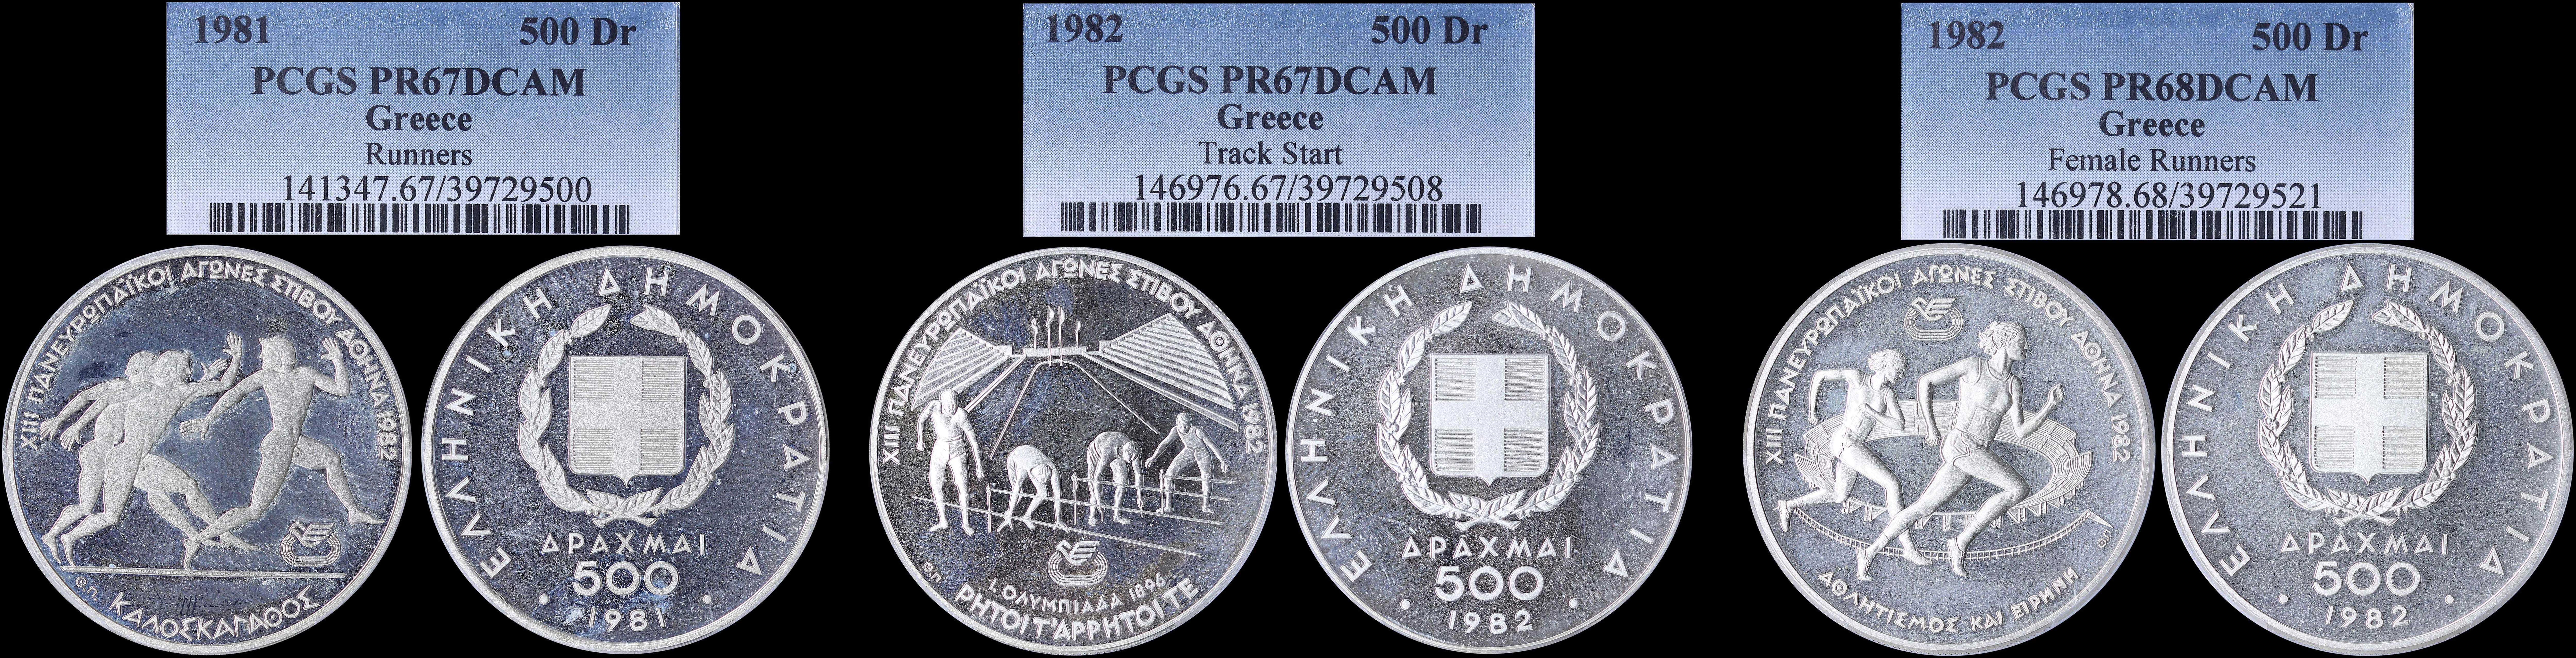 Lot 6279 - -  COINS & TOKENS HELLENIC REPUBLIC & COMMEMORATIVE ISSUES -  A. Karamitsos Public & Live Internet Auction 682 (Part A) Coins, Medals & Banknotes